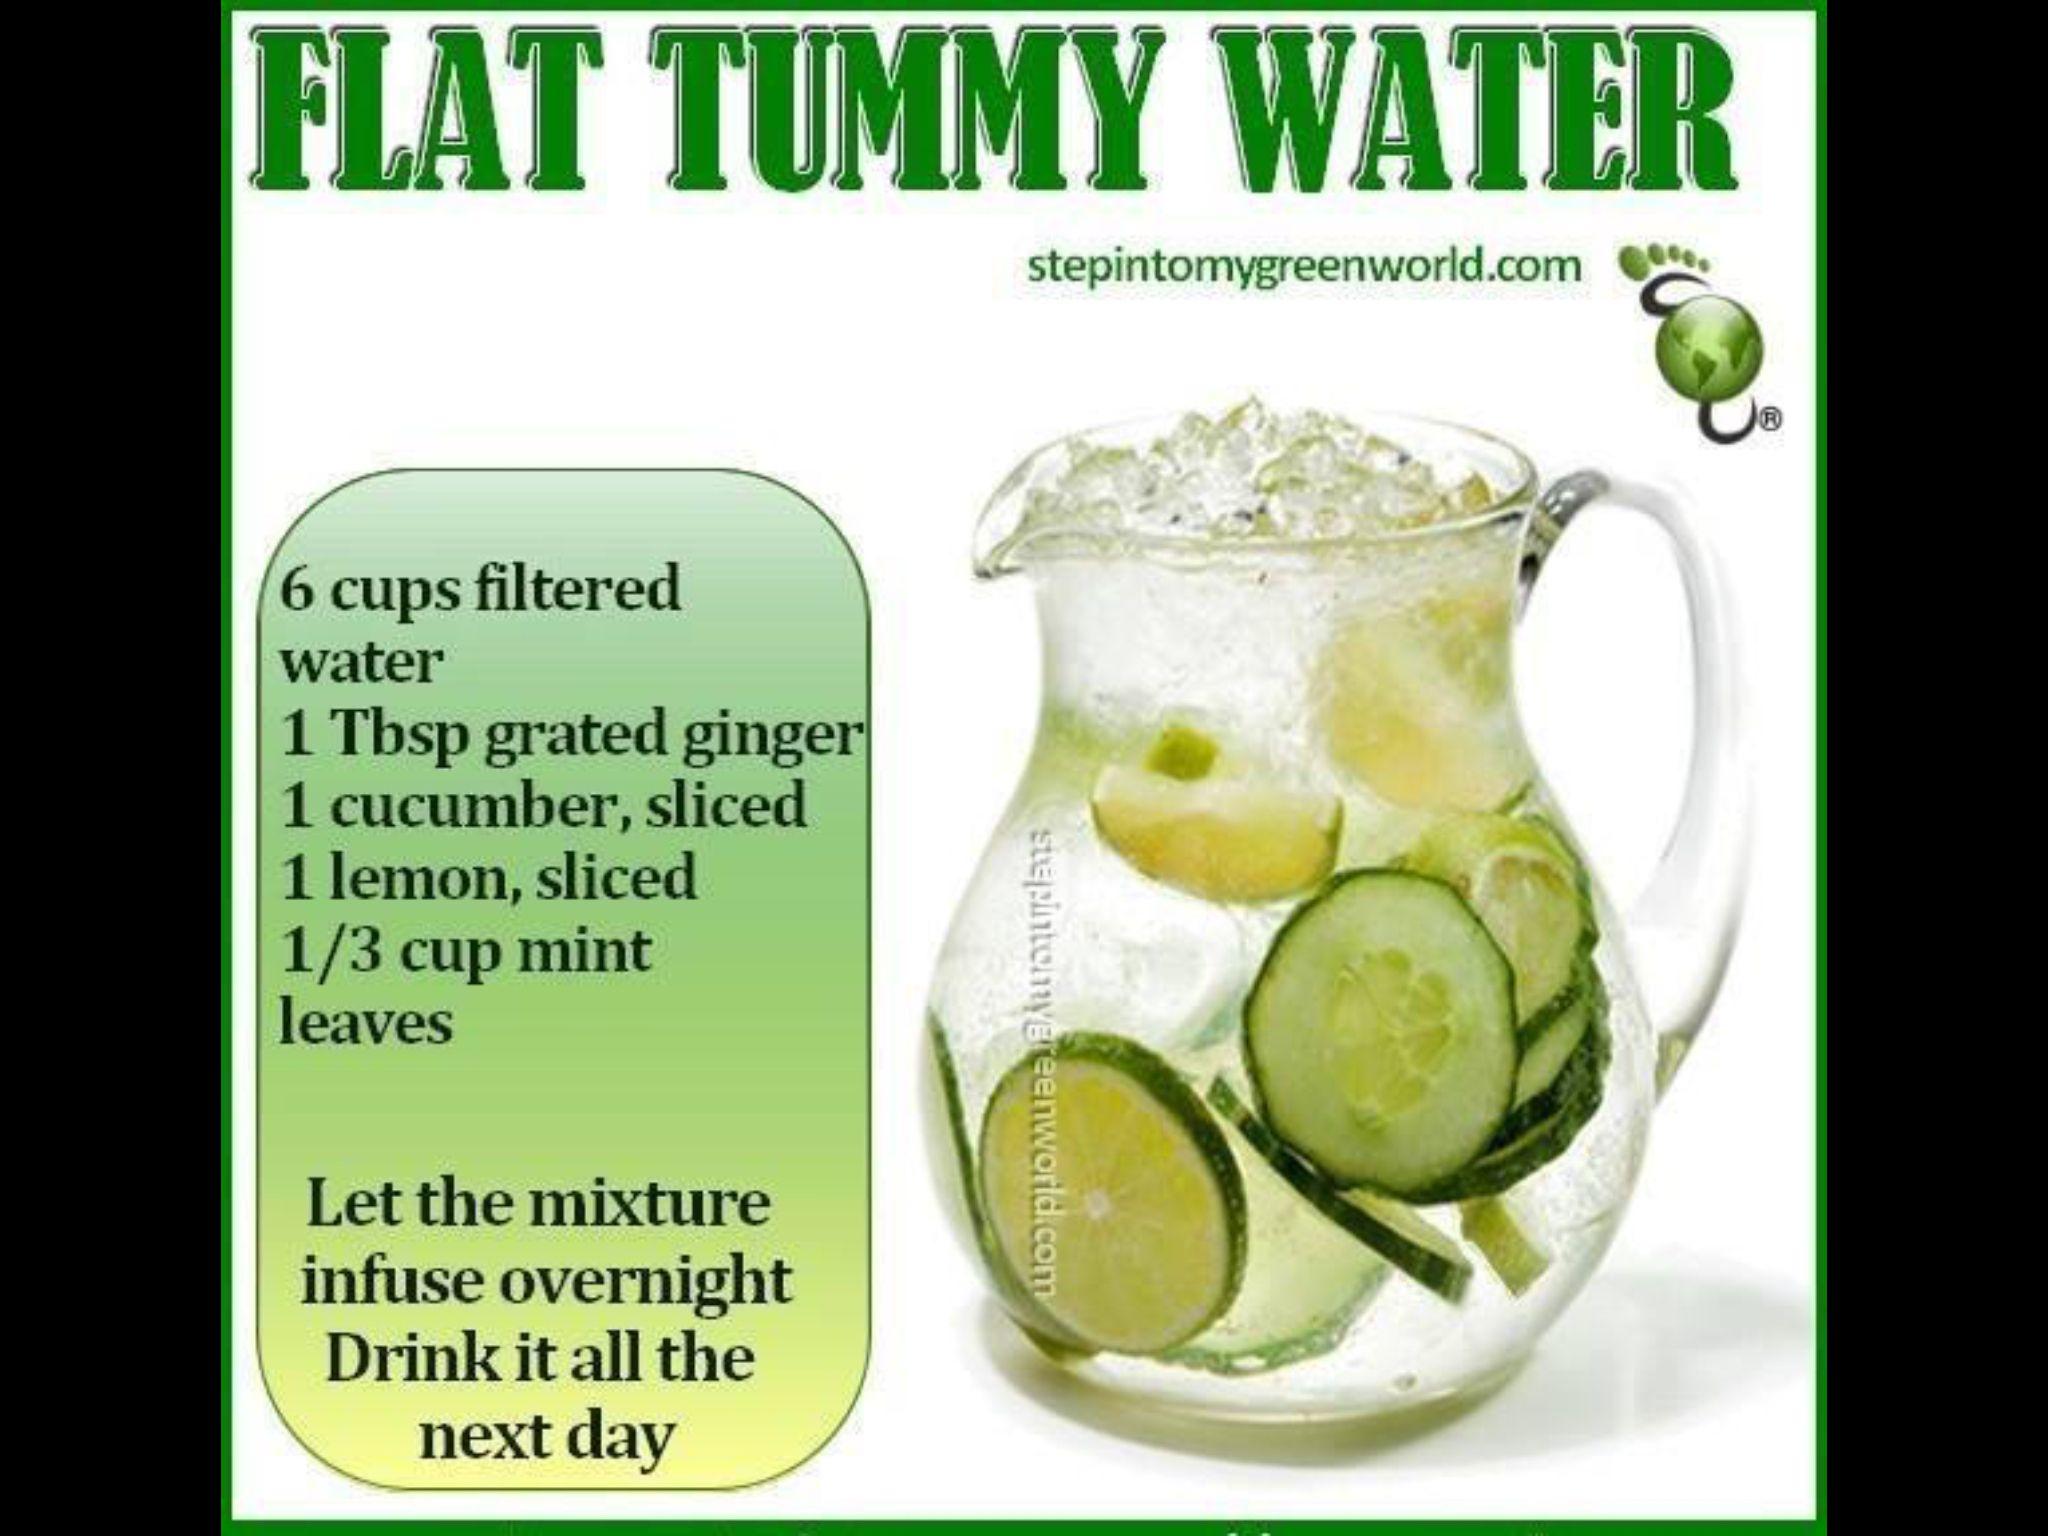 Flat Tummy Water